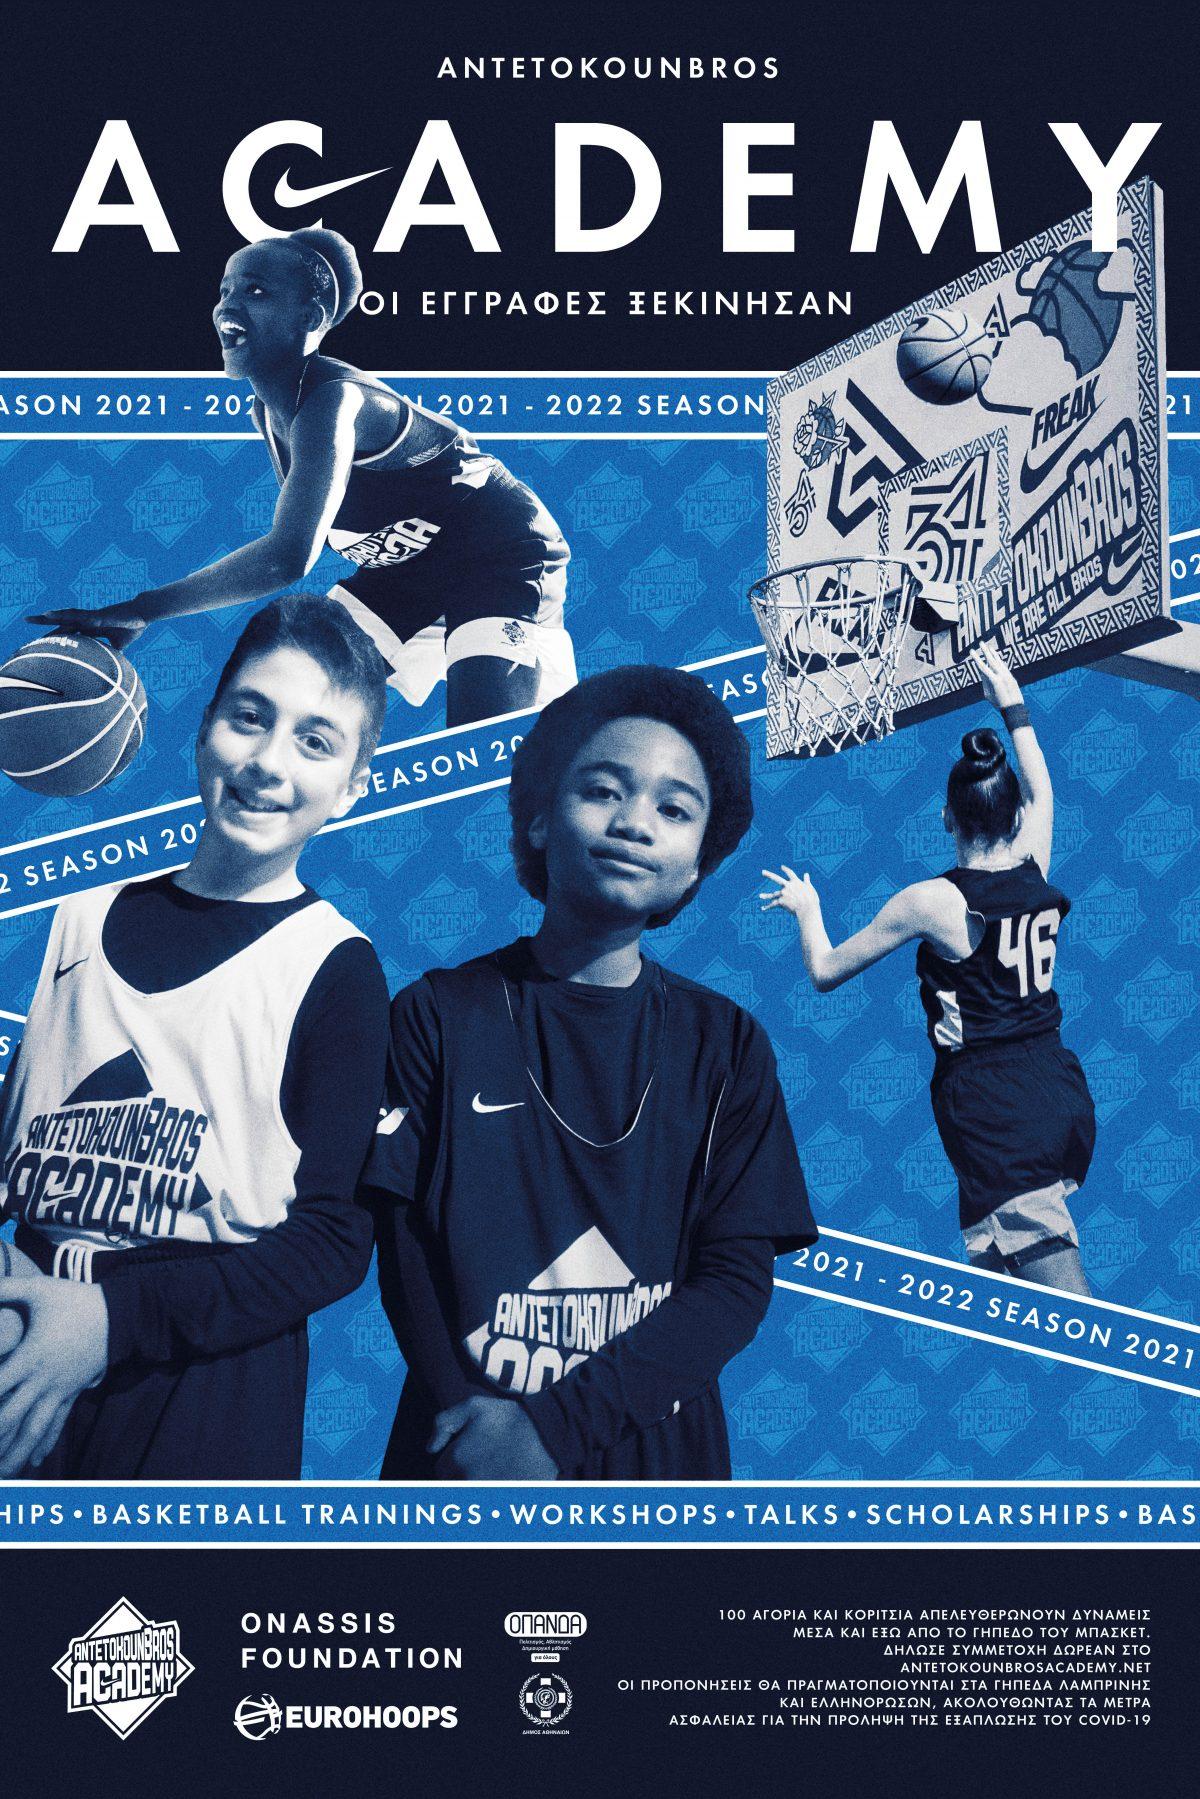 AntetokounBros Academy: Ξεκίνησαν οι εγγραφές για τους μικρούς λάτρεις του μπάσκετ!